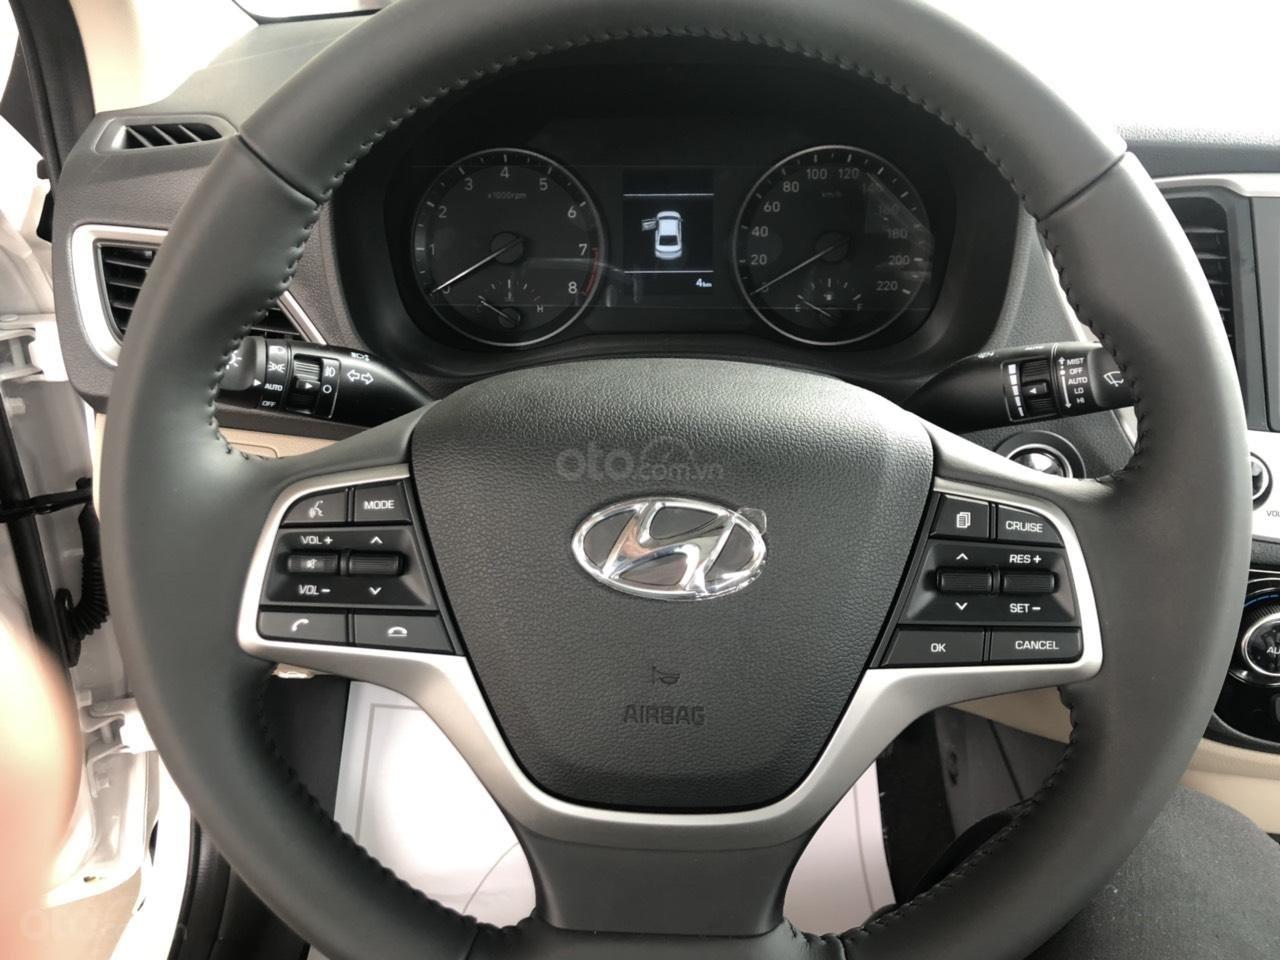 Bán Hyundai Accent 2019 - Giá tốt - xe sẵn - Bank bao đậu (11)